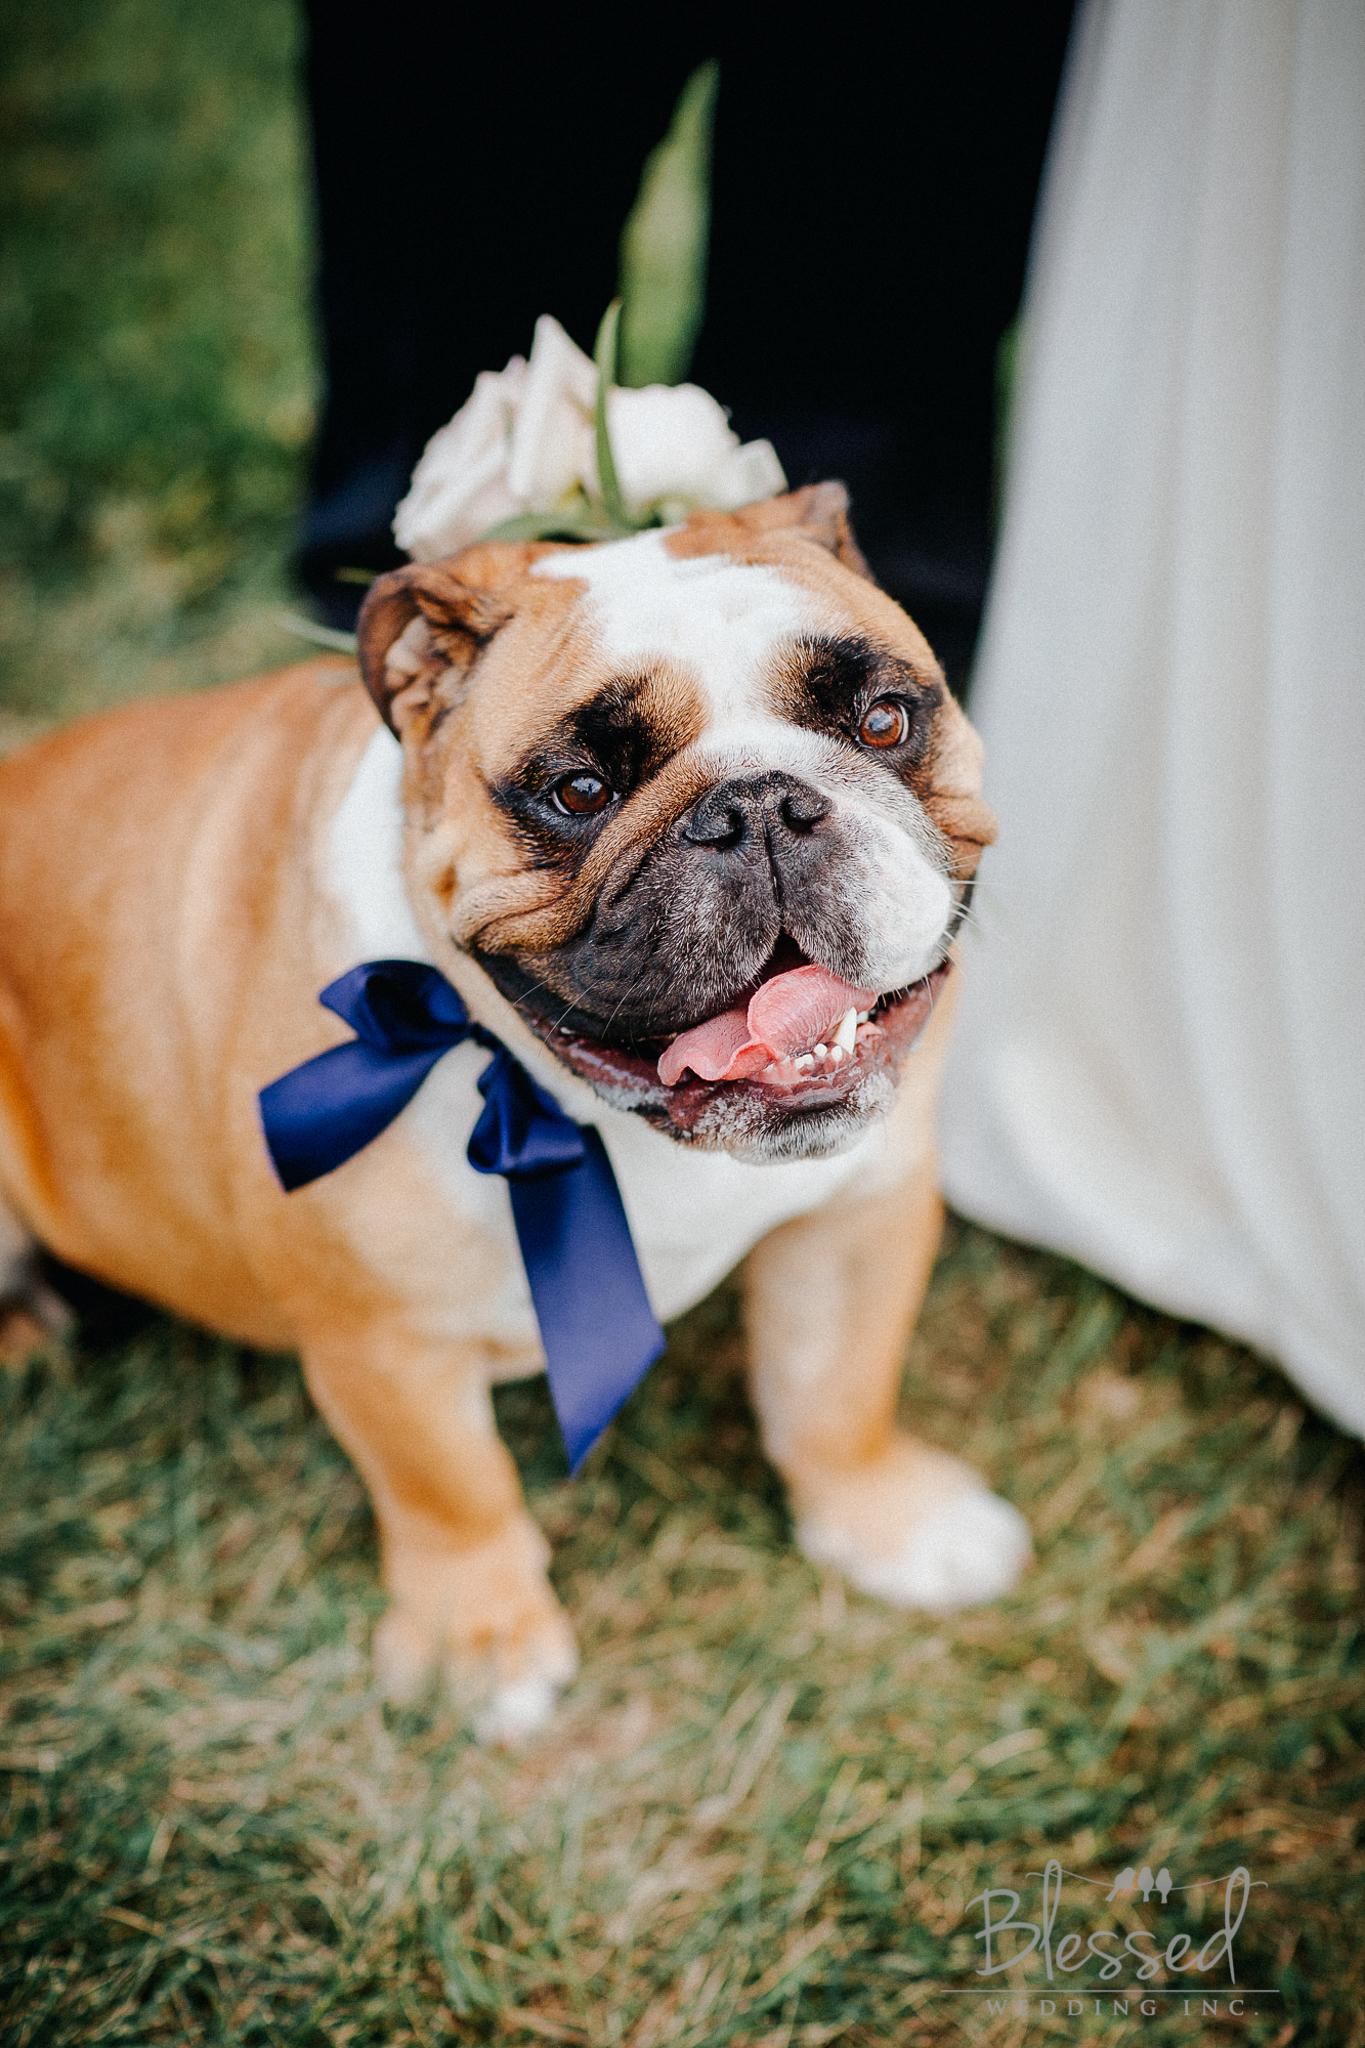 Destination Wedding Photography Minnesota By Blessed Wedding Photographers-28.jpg